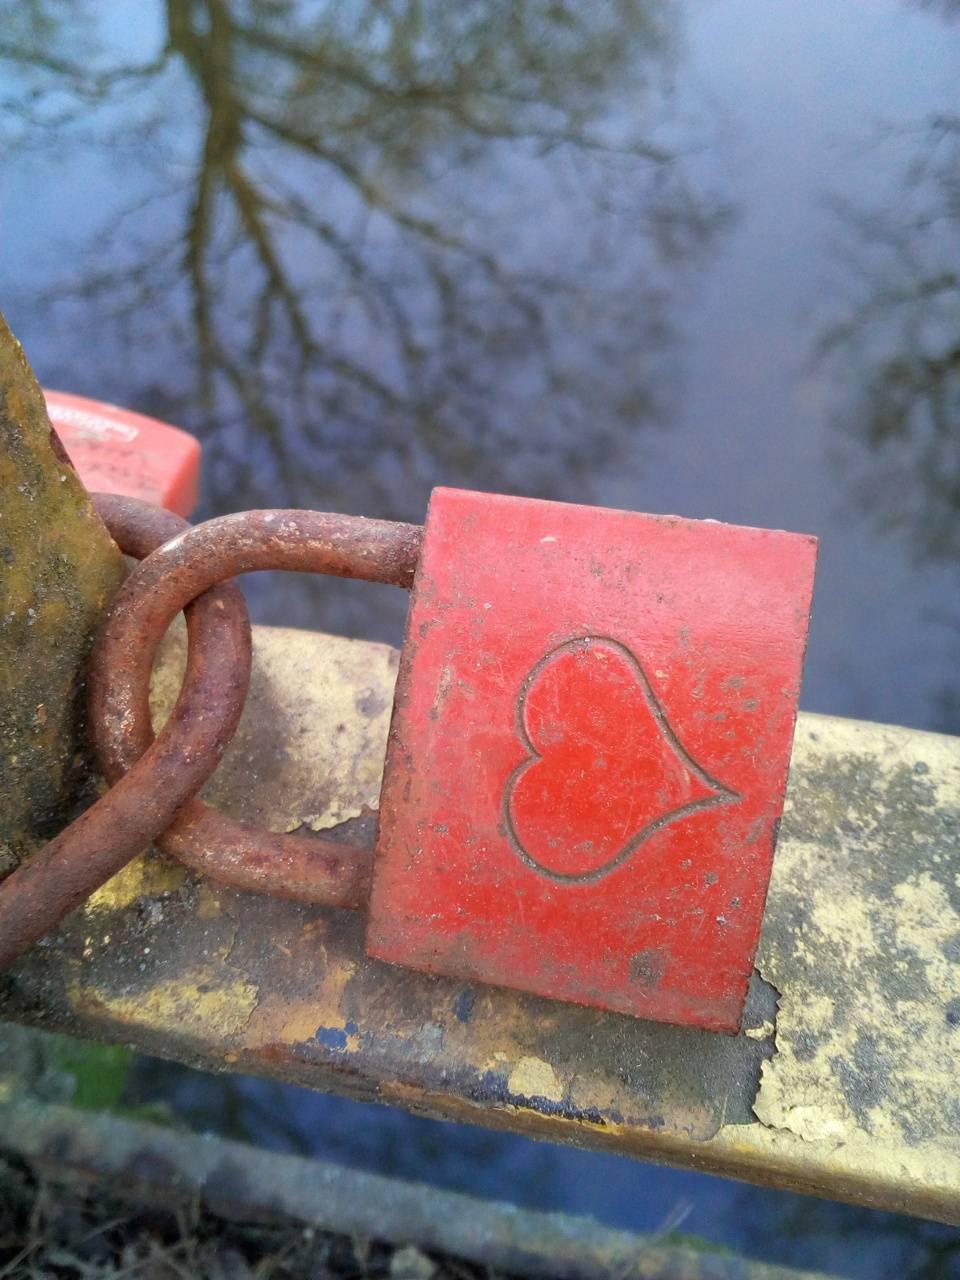 A love closed locked